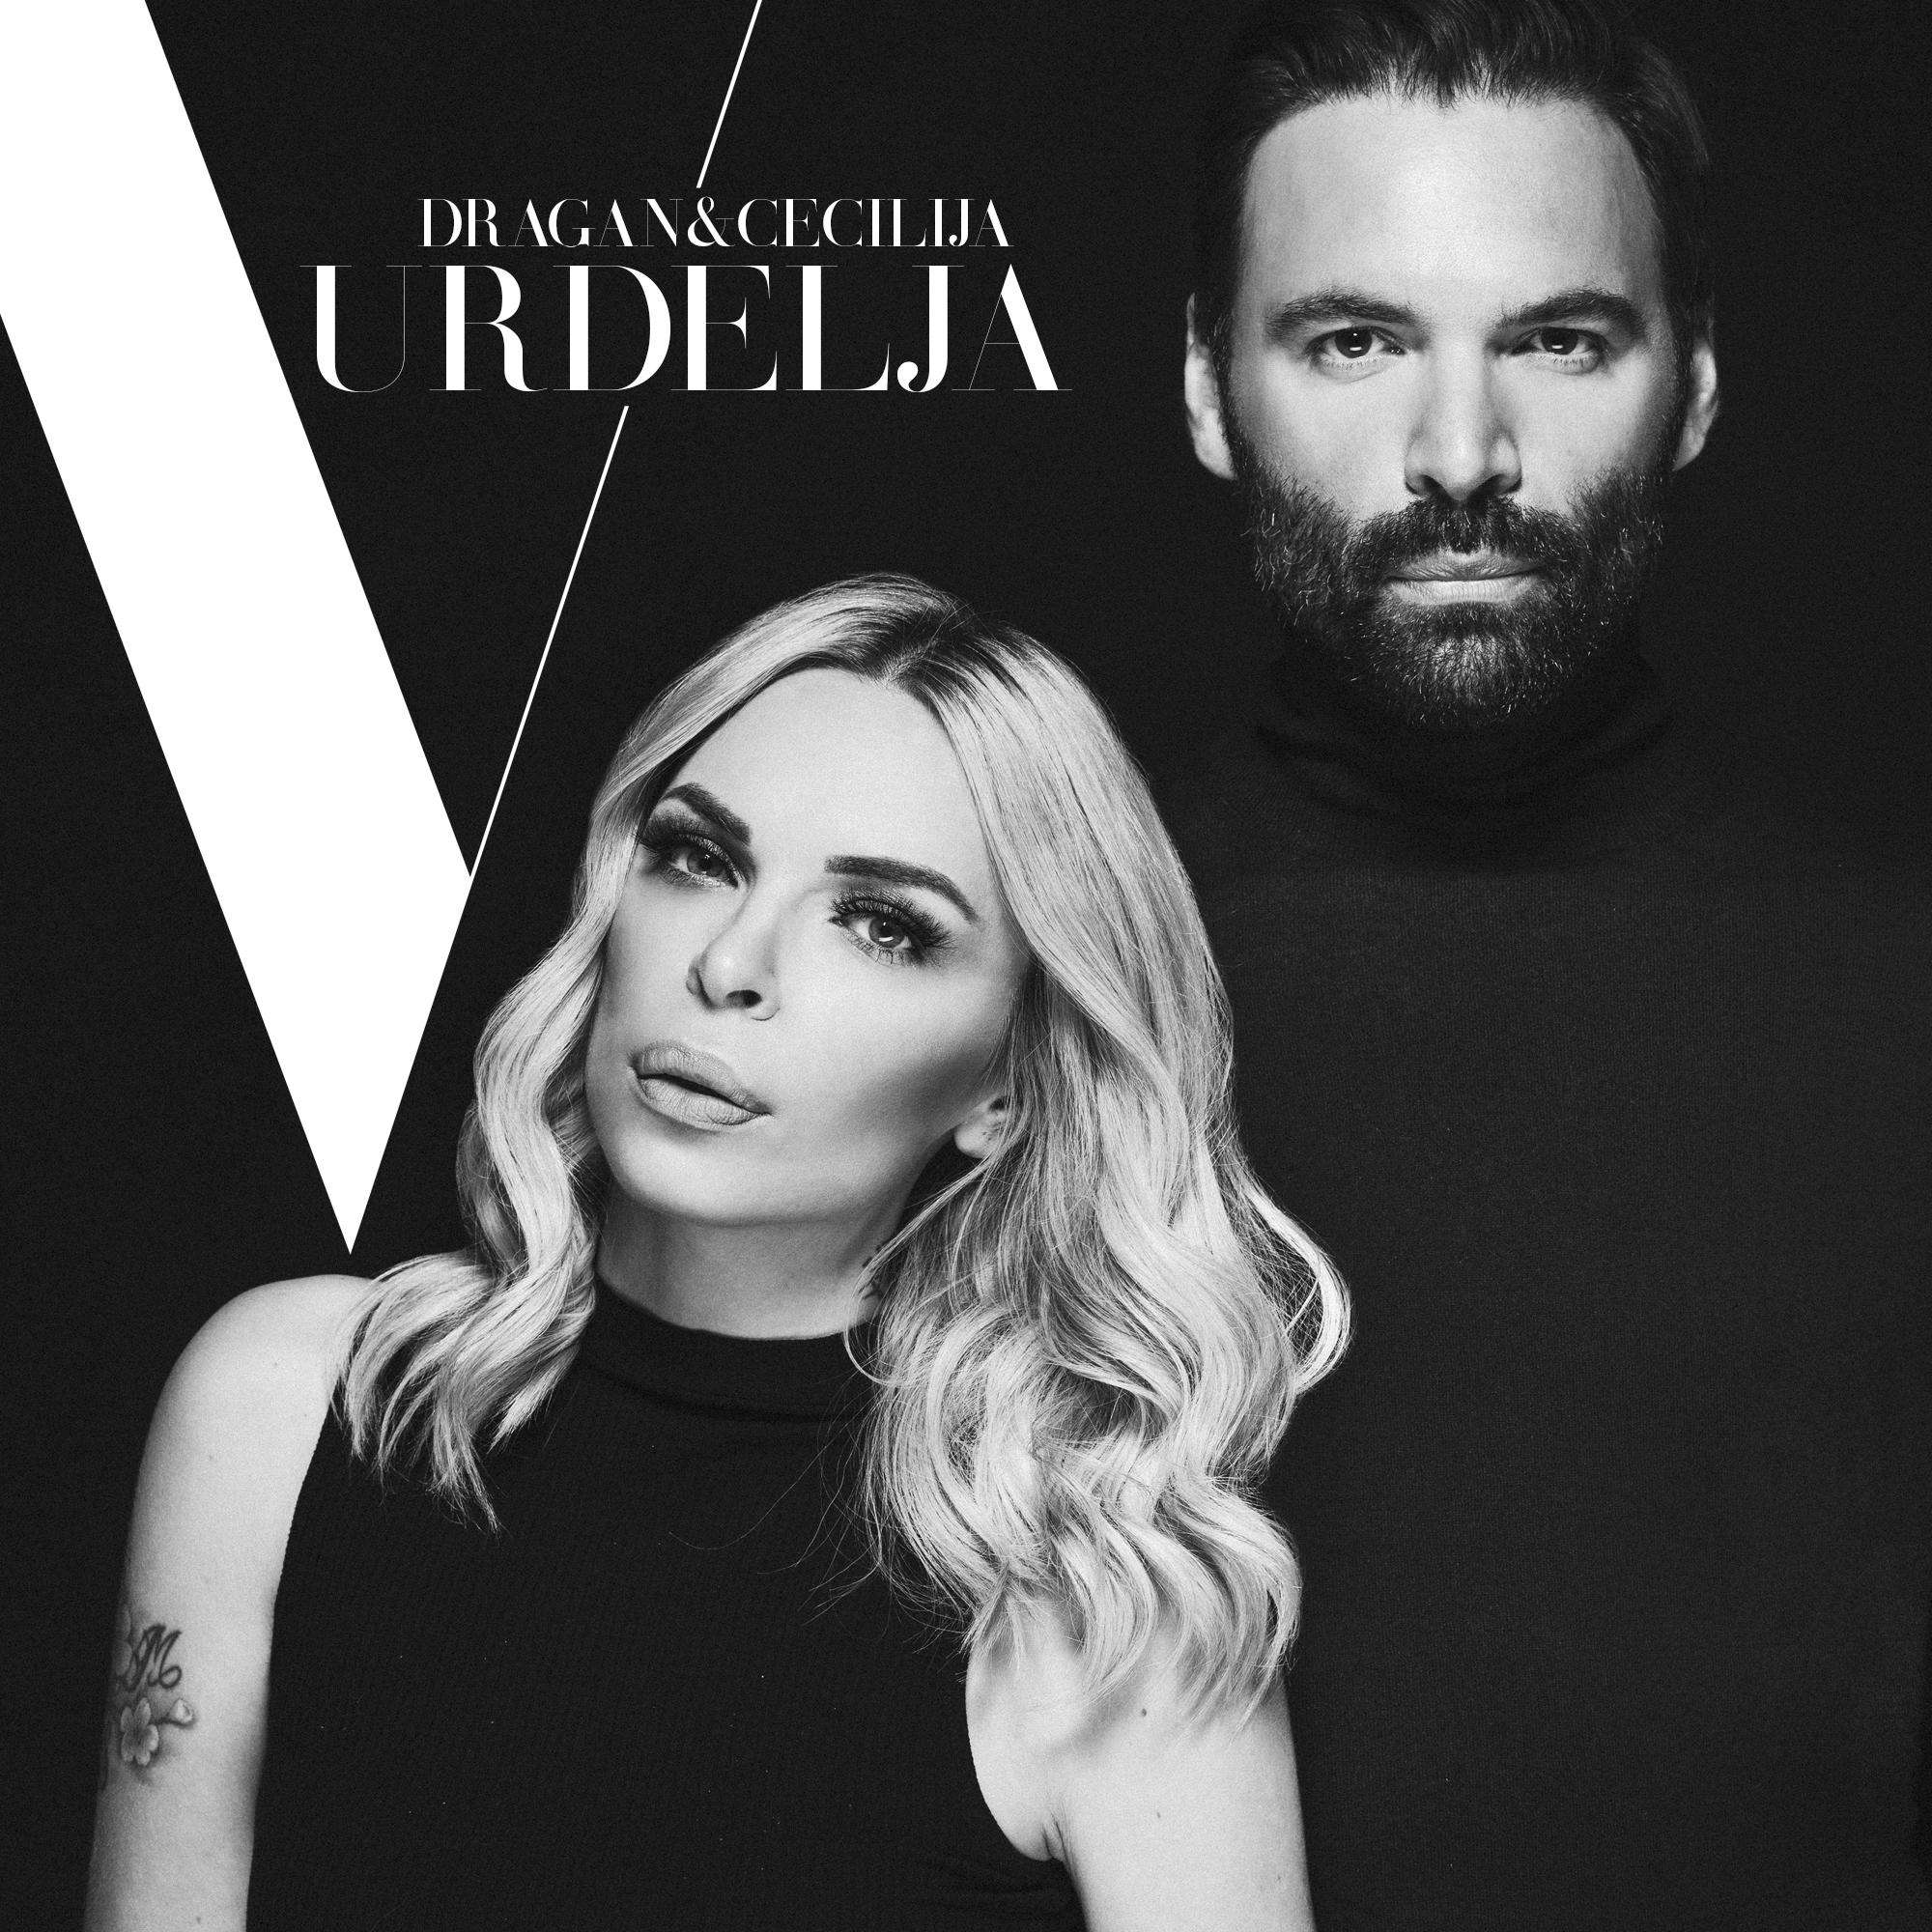 Dragan & Cecilija Vurdelja